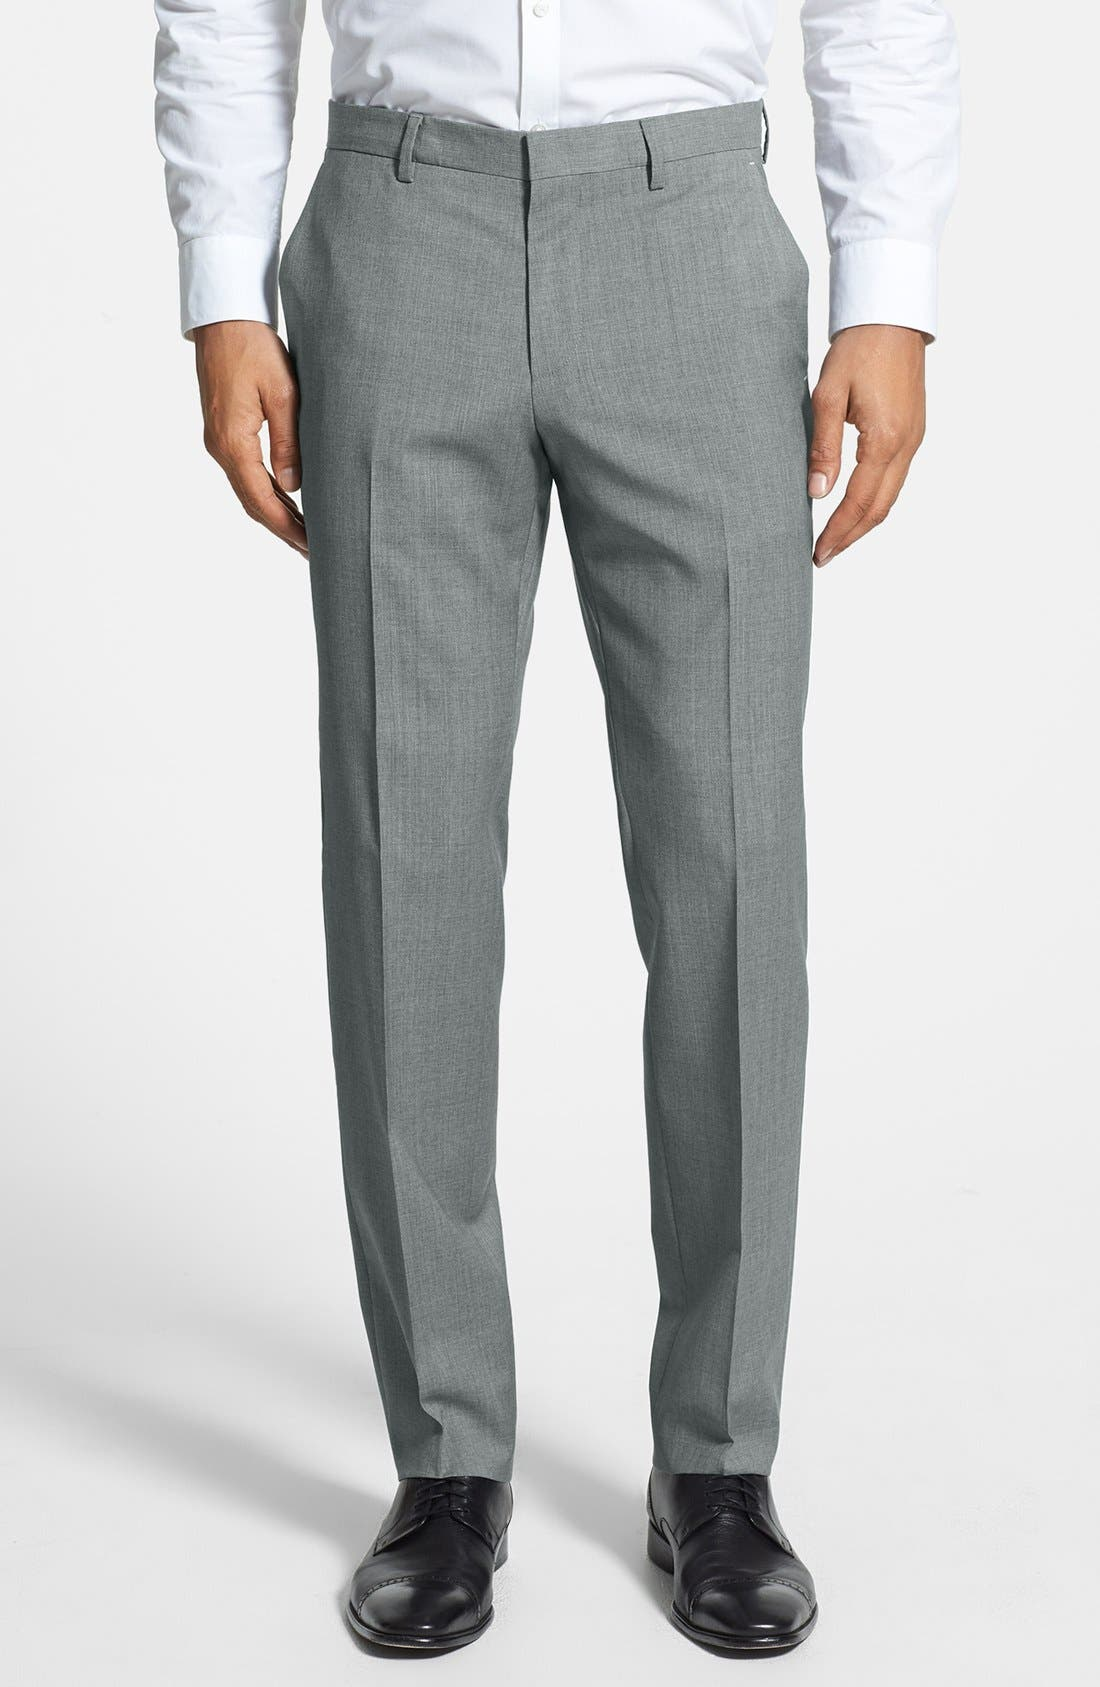 BOSS Genesis Slim-Fit Wool Trousers, Light Gray in Grey